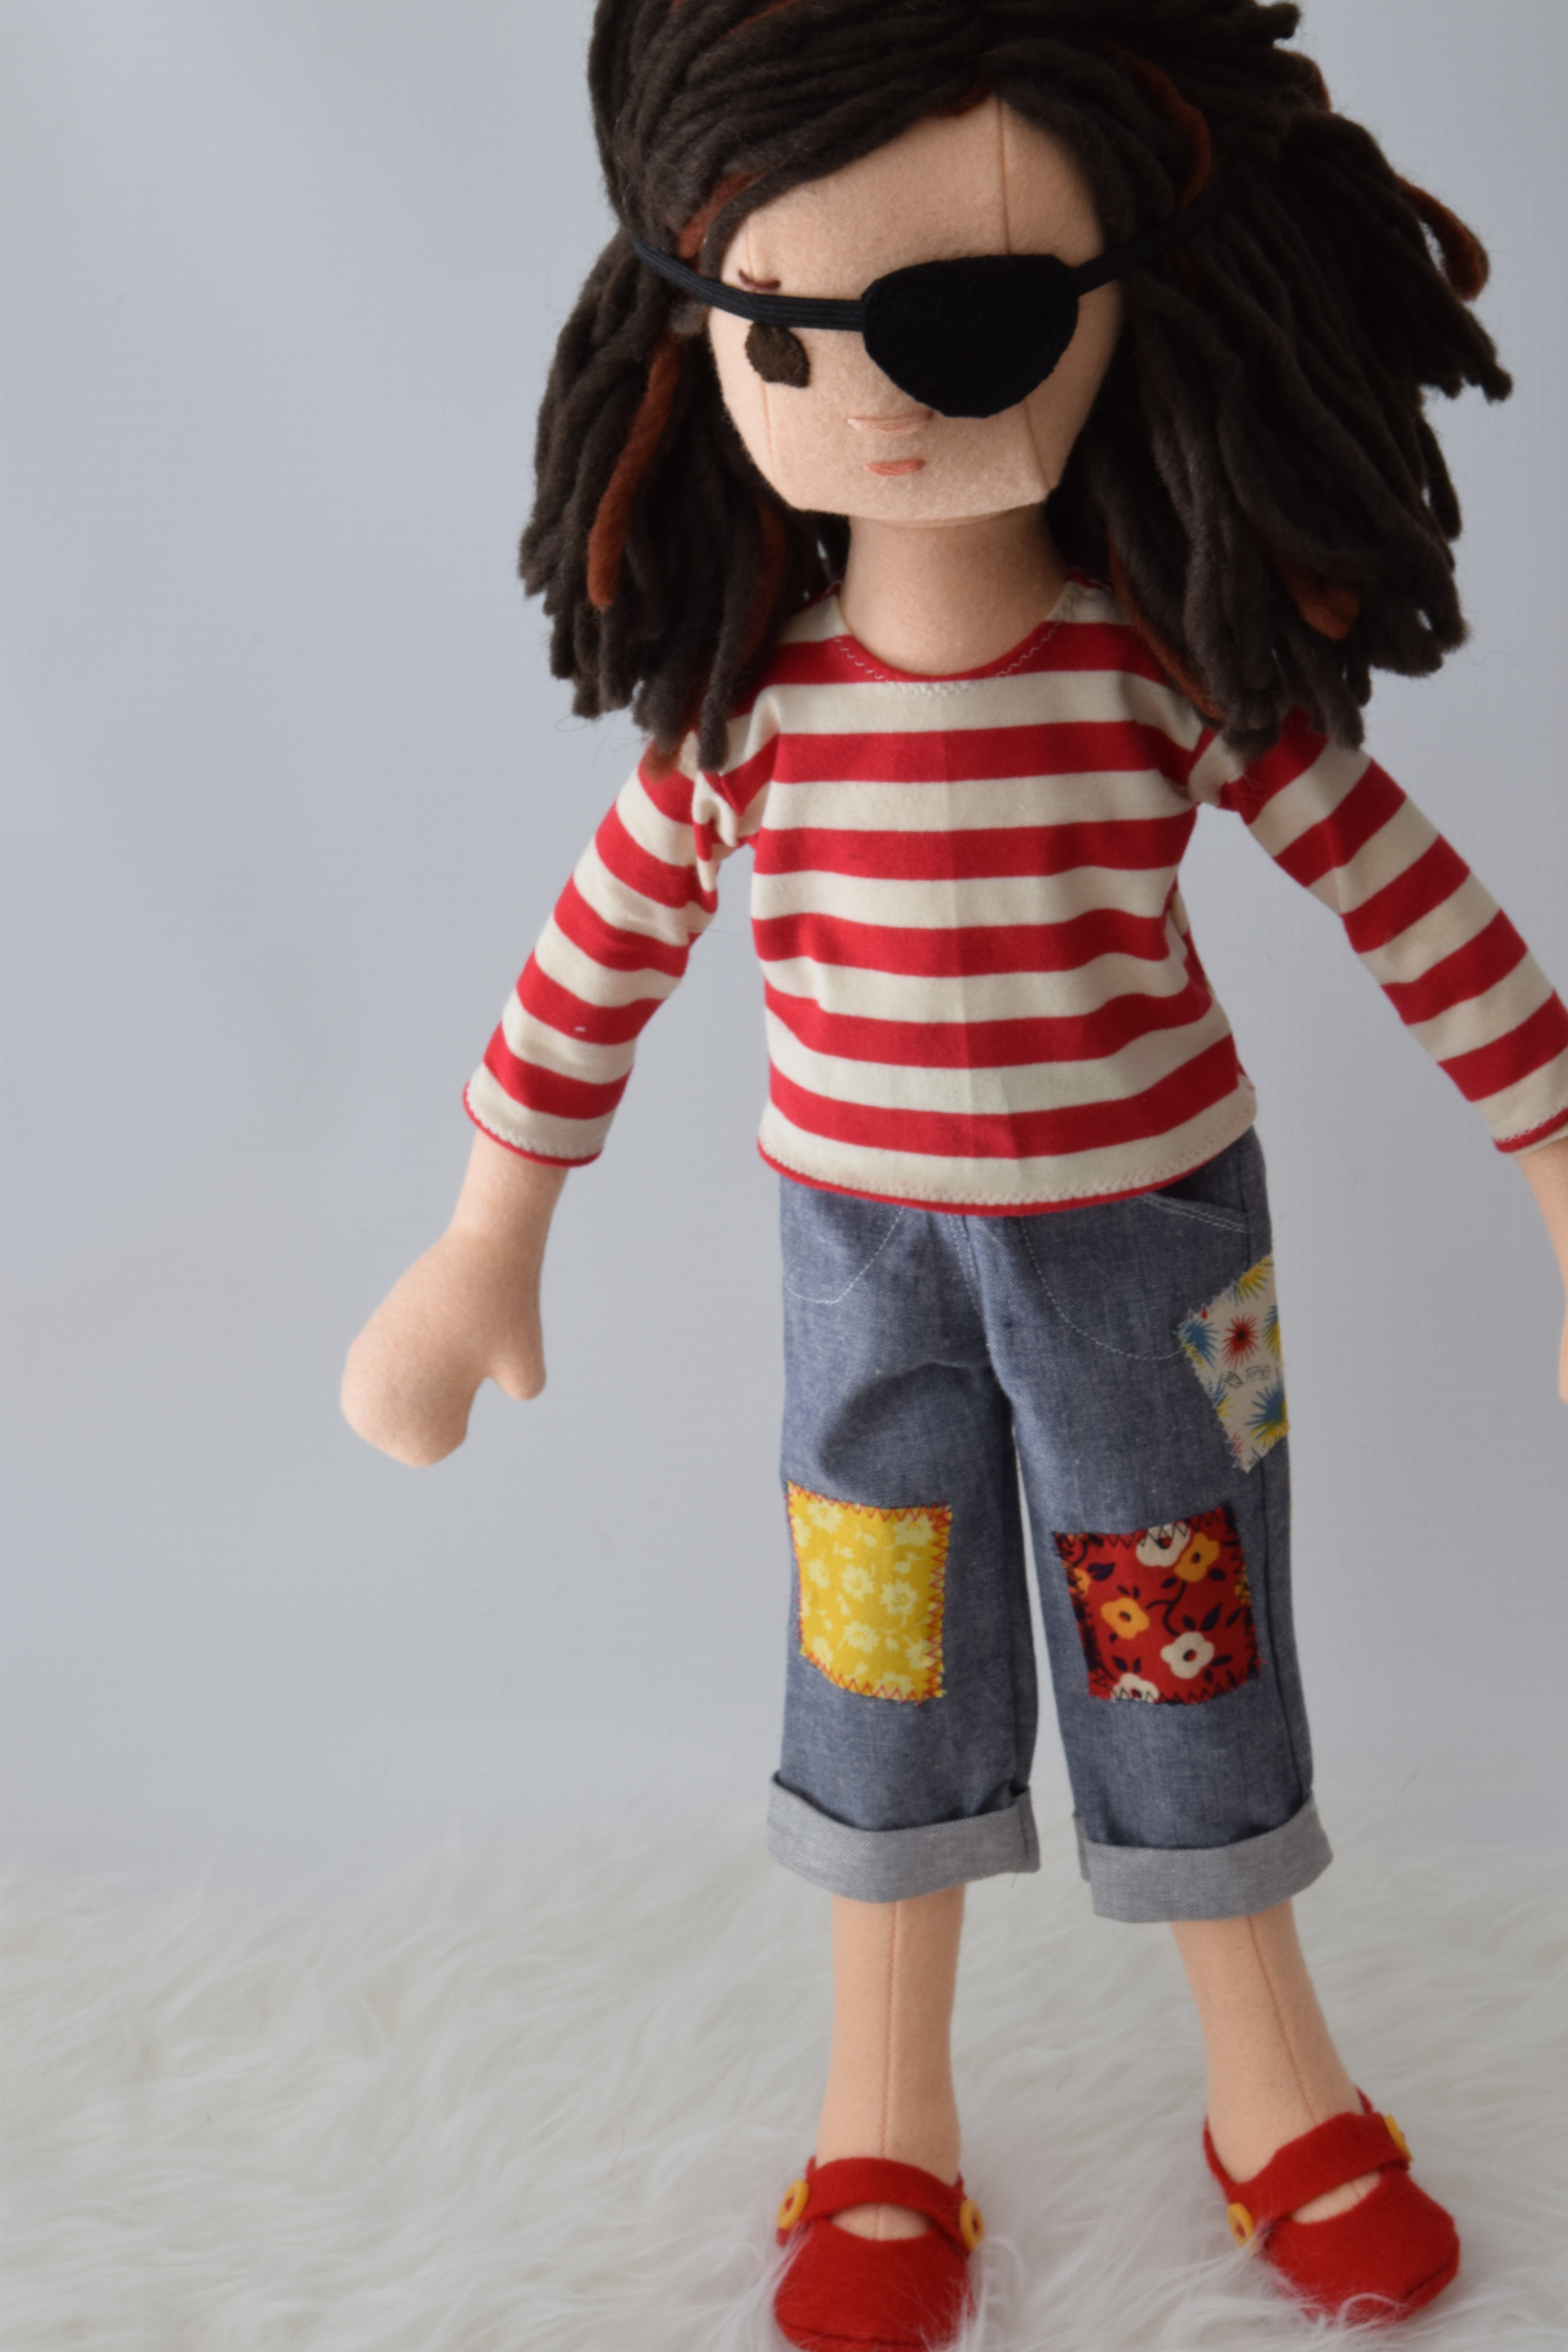 The Handmade Dolls-643.jpg